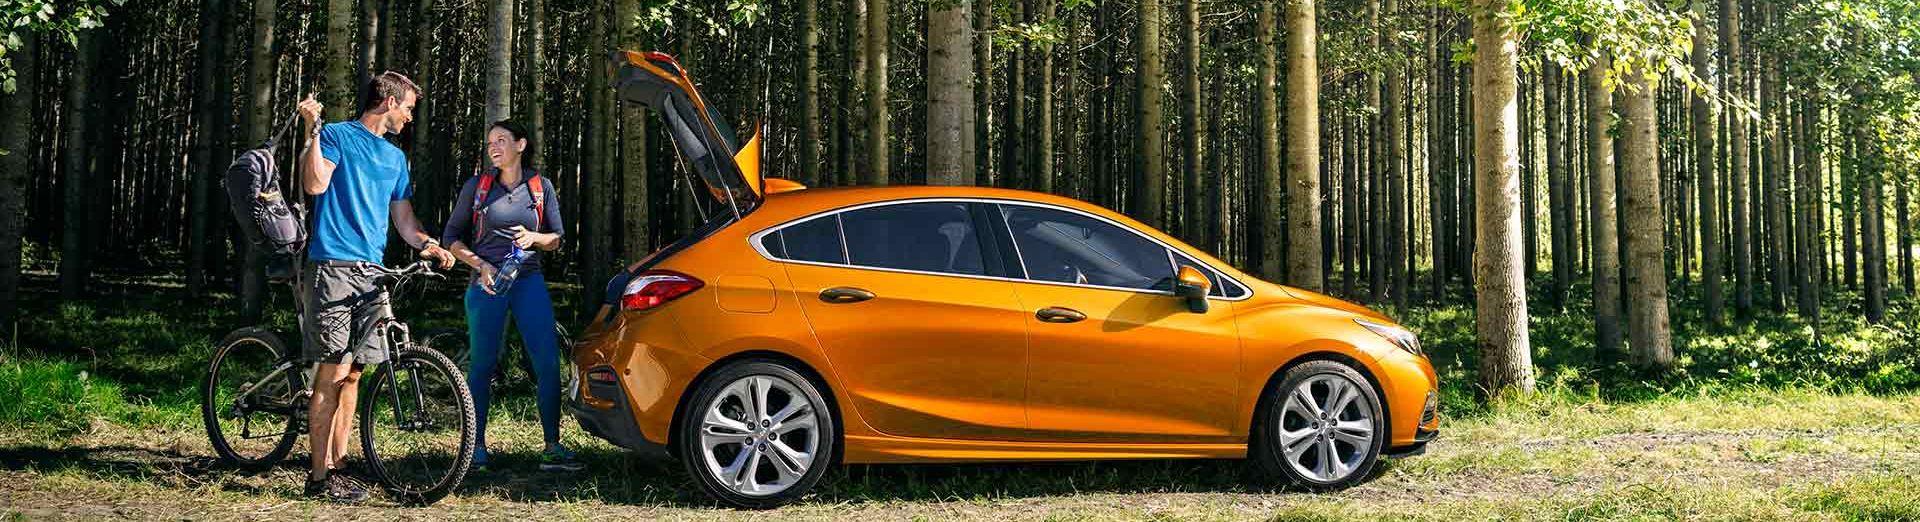 Chevrolet Cruze Repair Manual: Ultra High Strength Dual Phase Steel